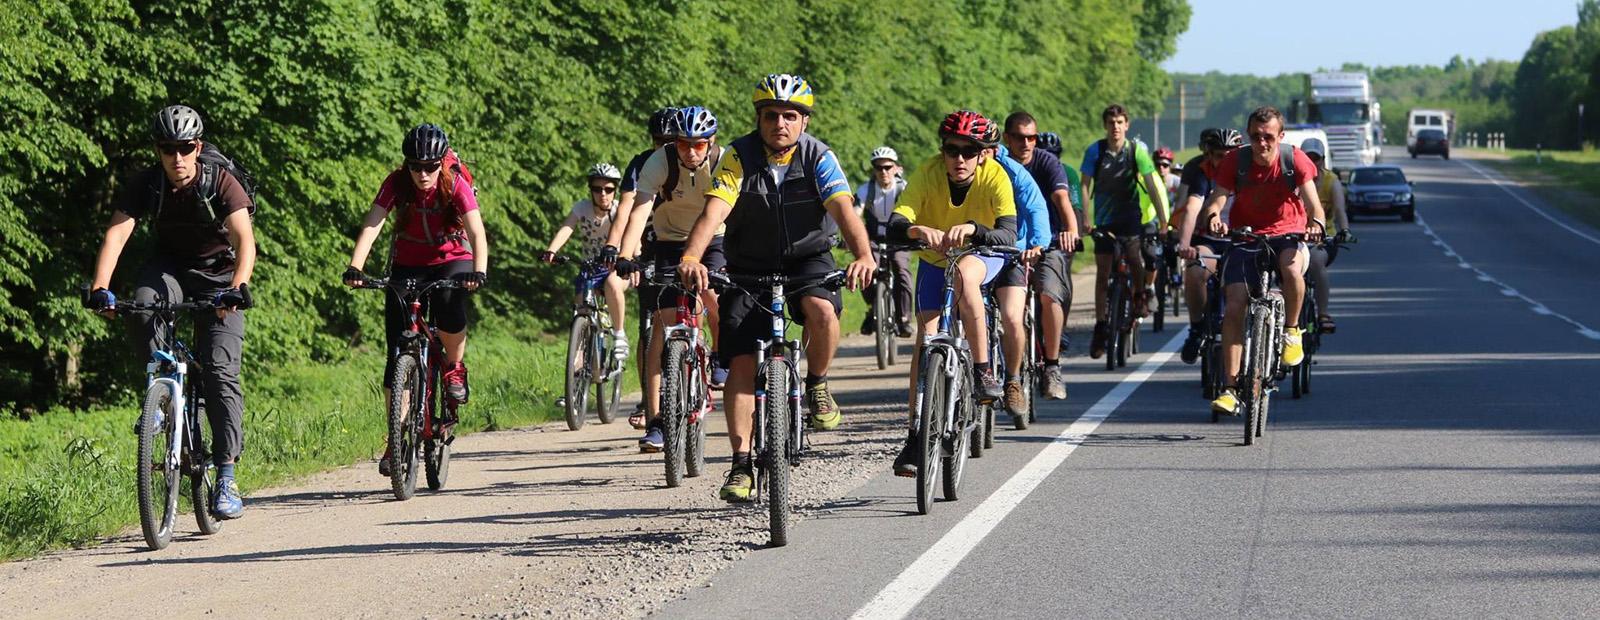 Поради та маршрути для старту велосезону